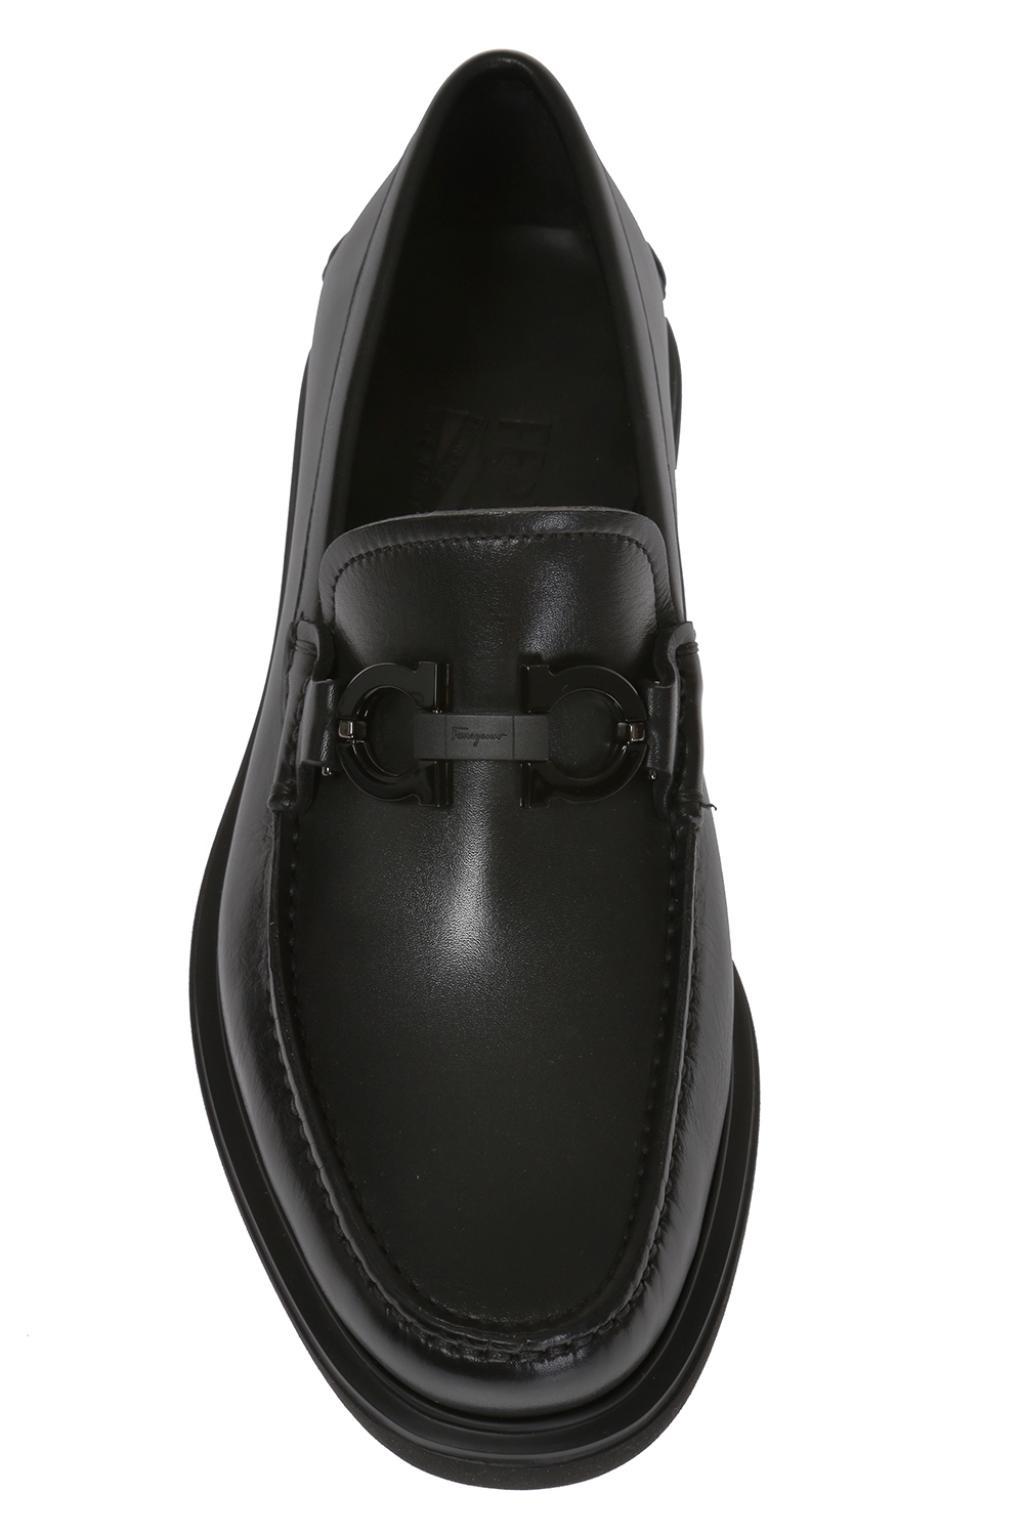 Salvatore Ferragamo Buty 'Gotham' typu 'loafers'